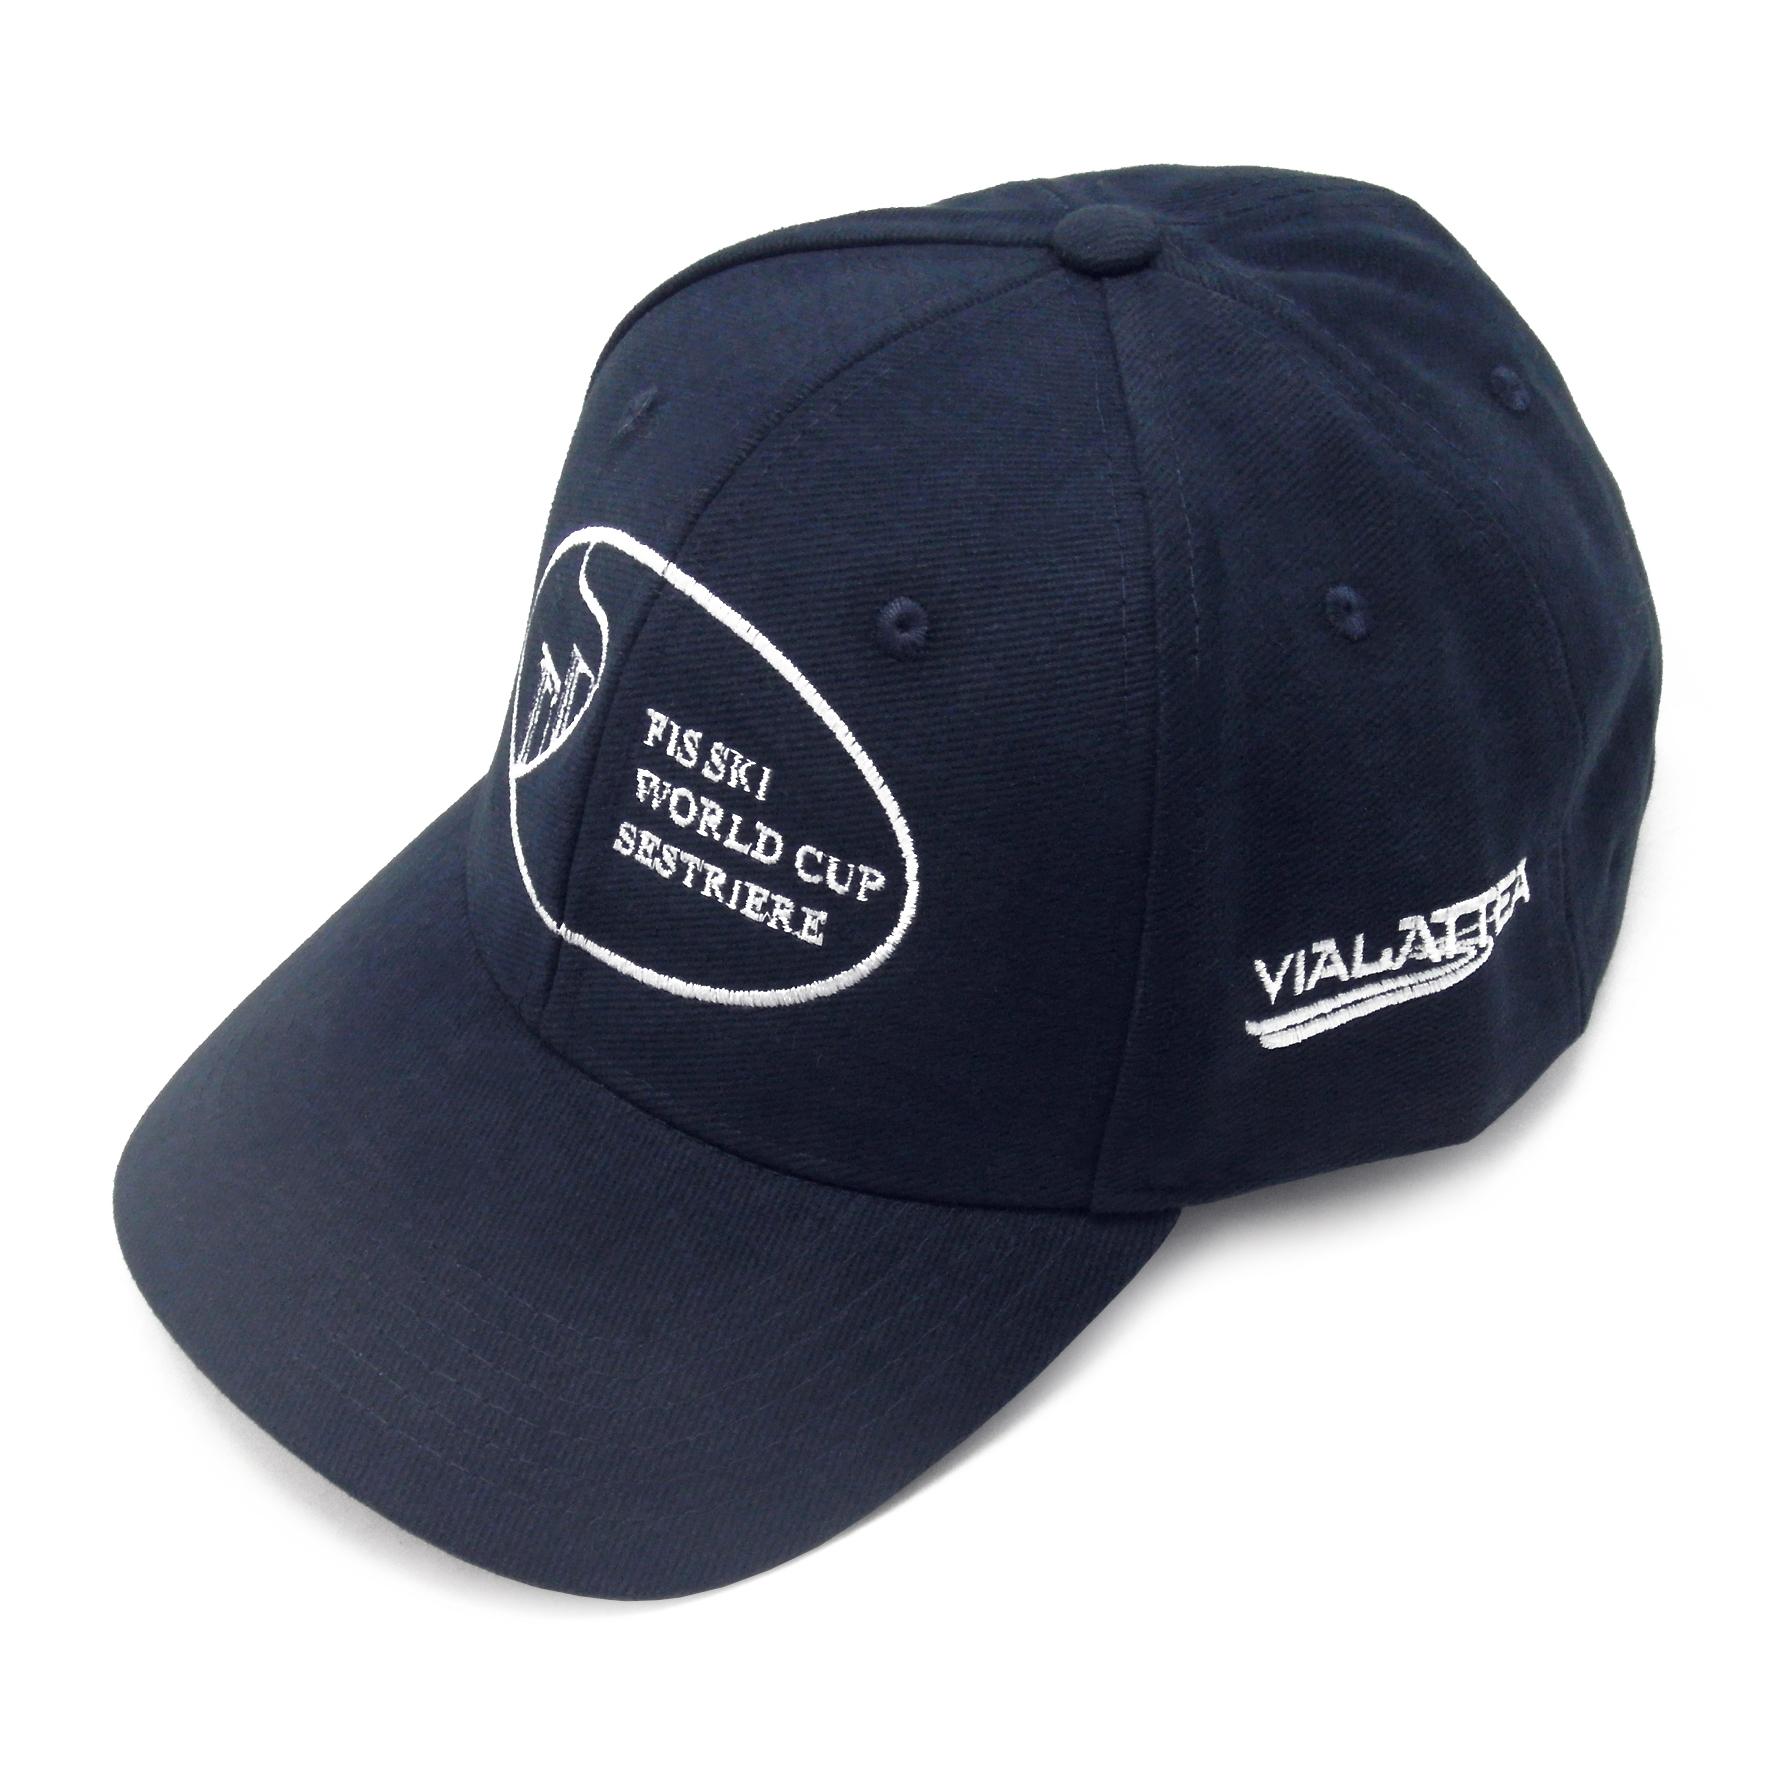 cappellino-ricamato-fis-ski-world-cup-sestrieres